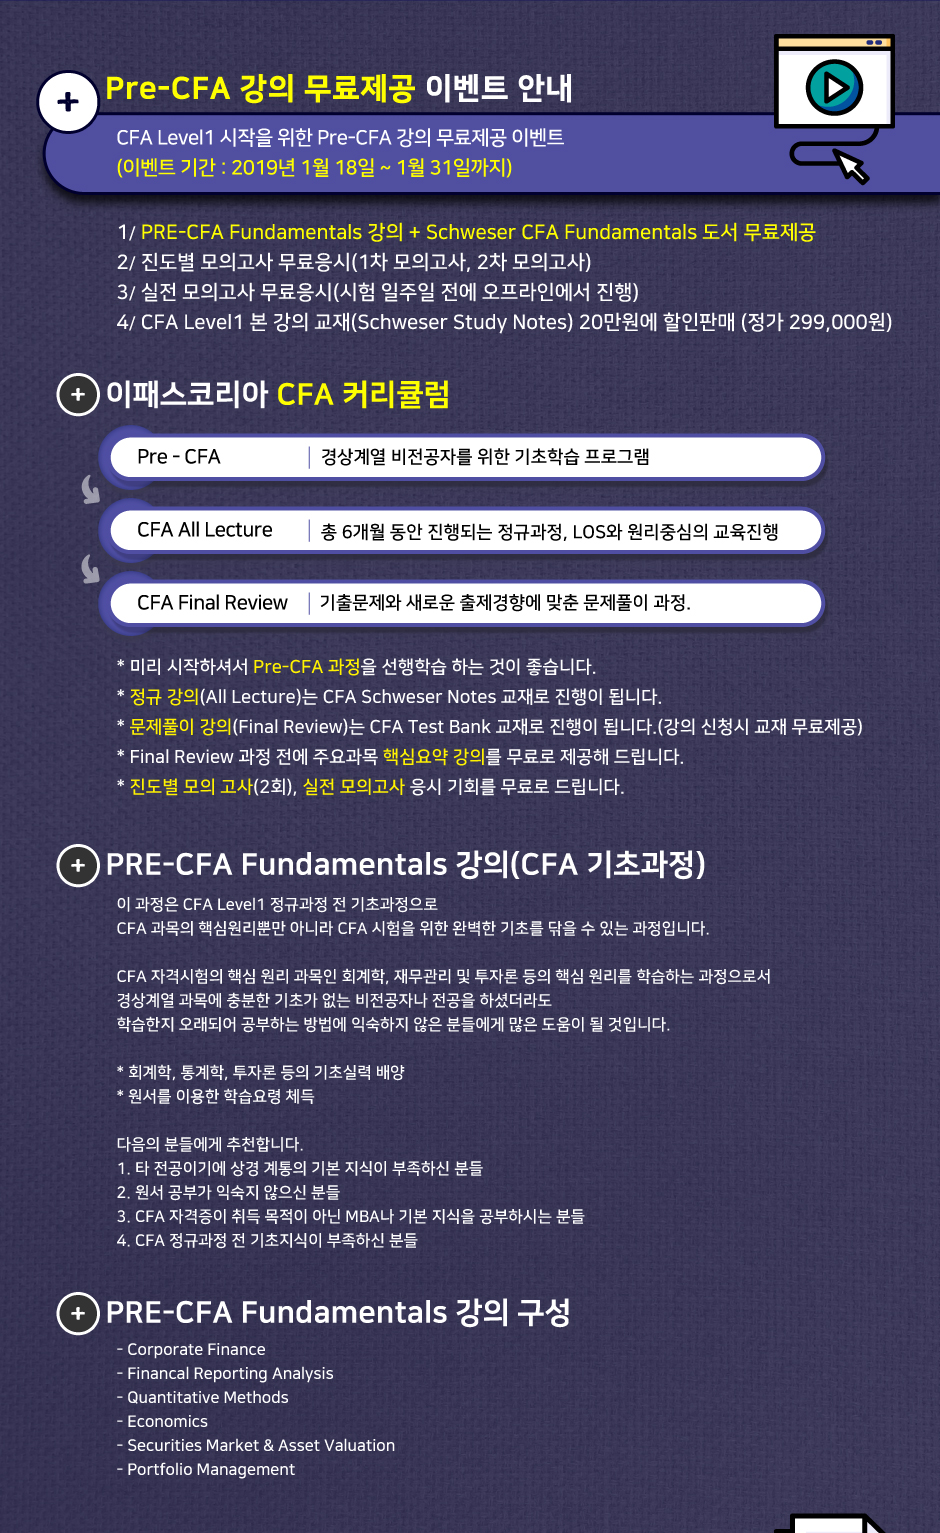 Pre-CFA 강의 & CFA Fundamentals 교재 무료제공